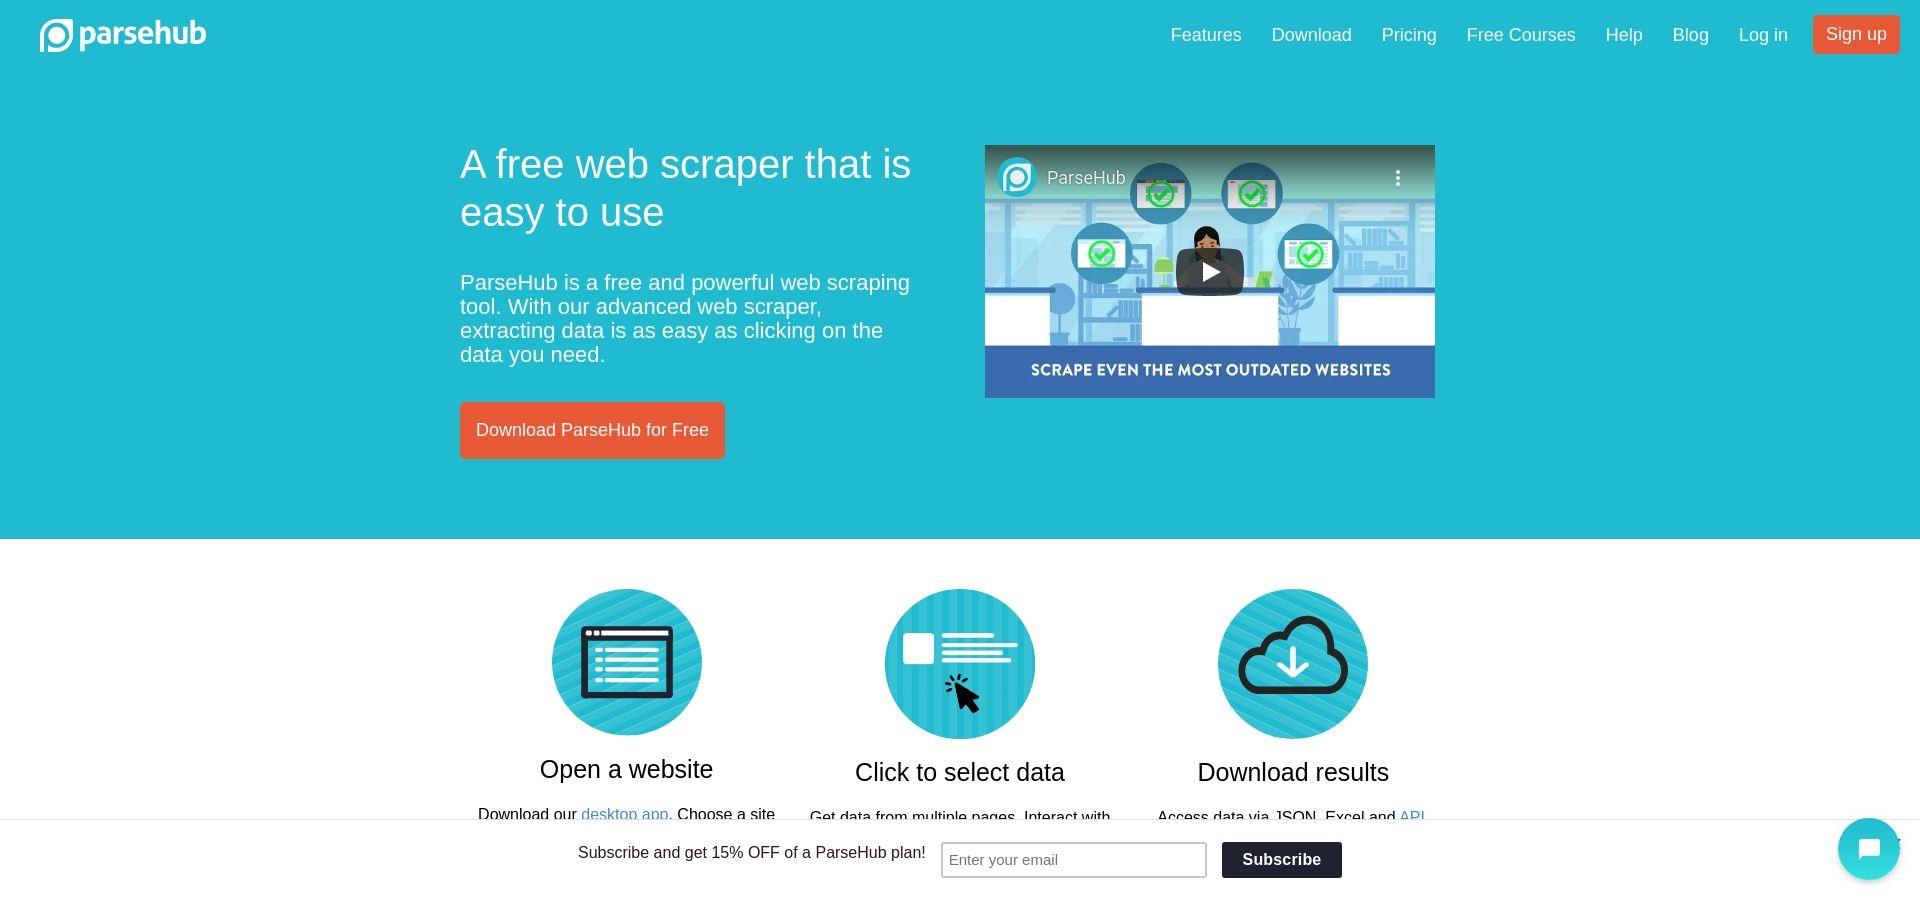 ParseHub | Free web scraping - The most powerful web scraper